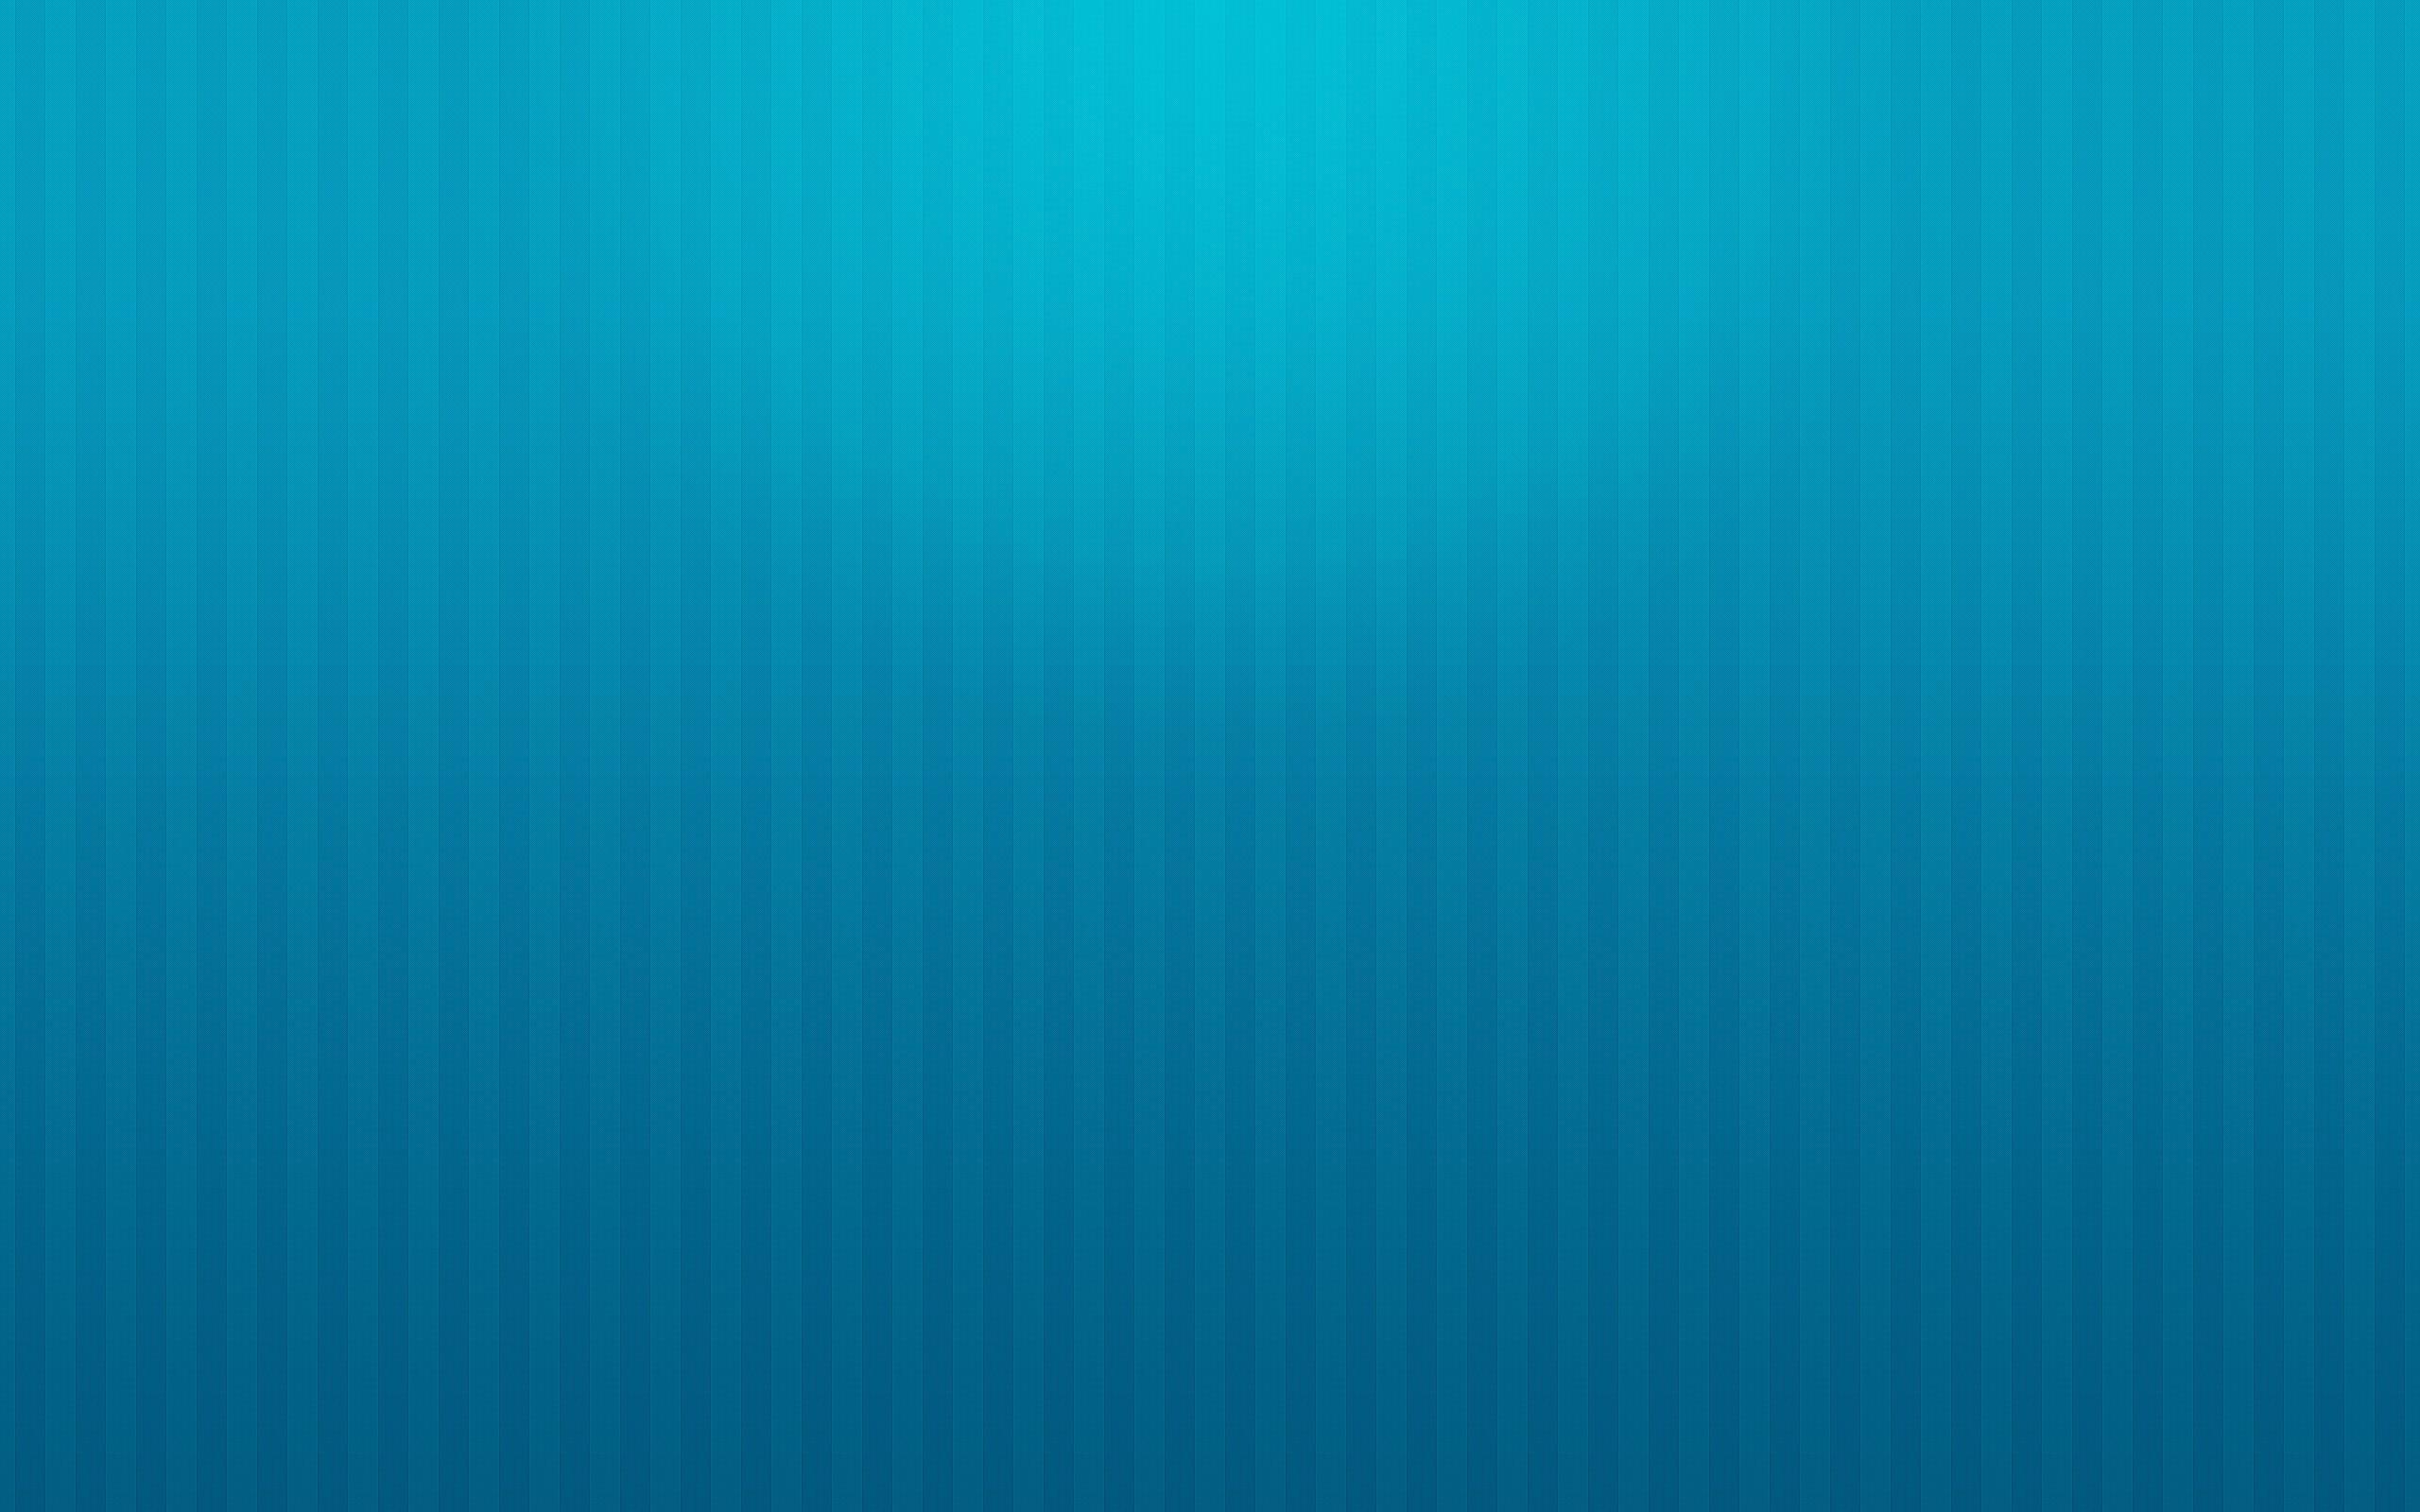 … light blue lining plain desktop background.